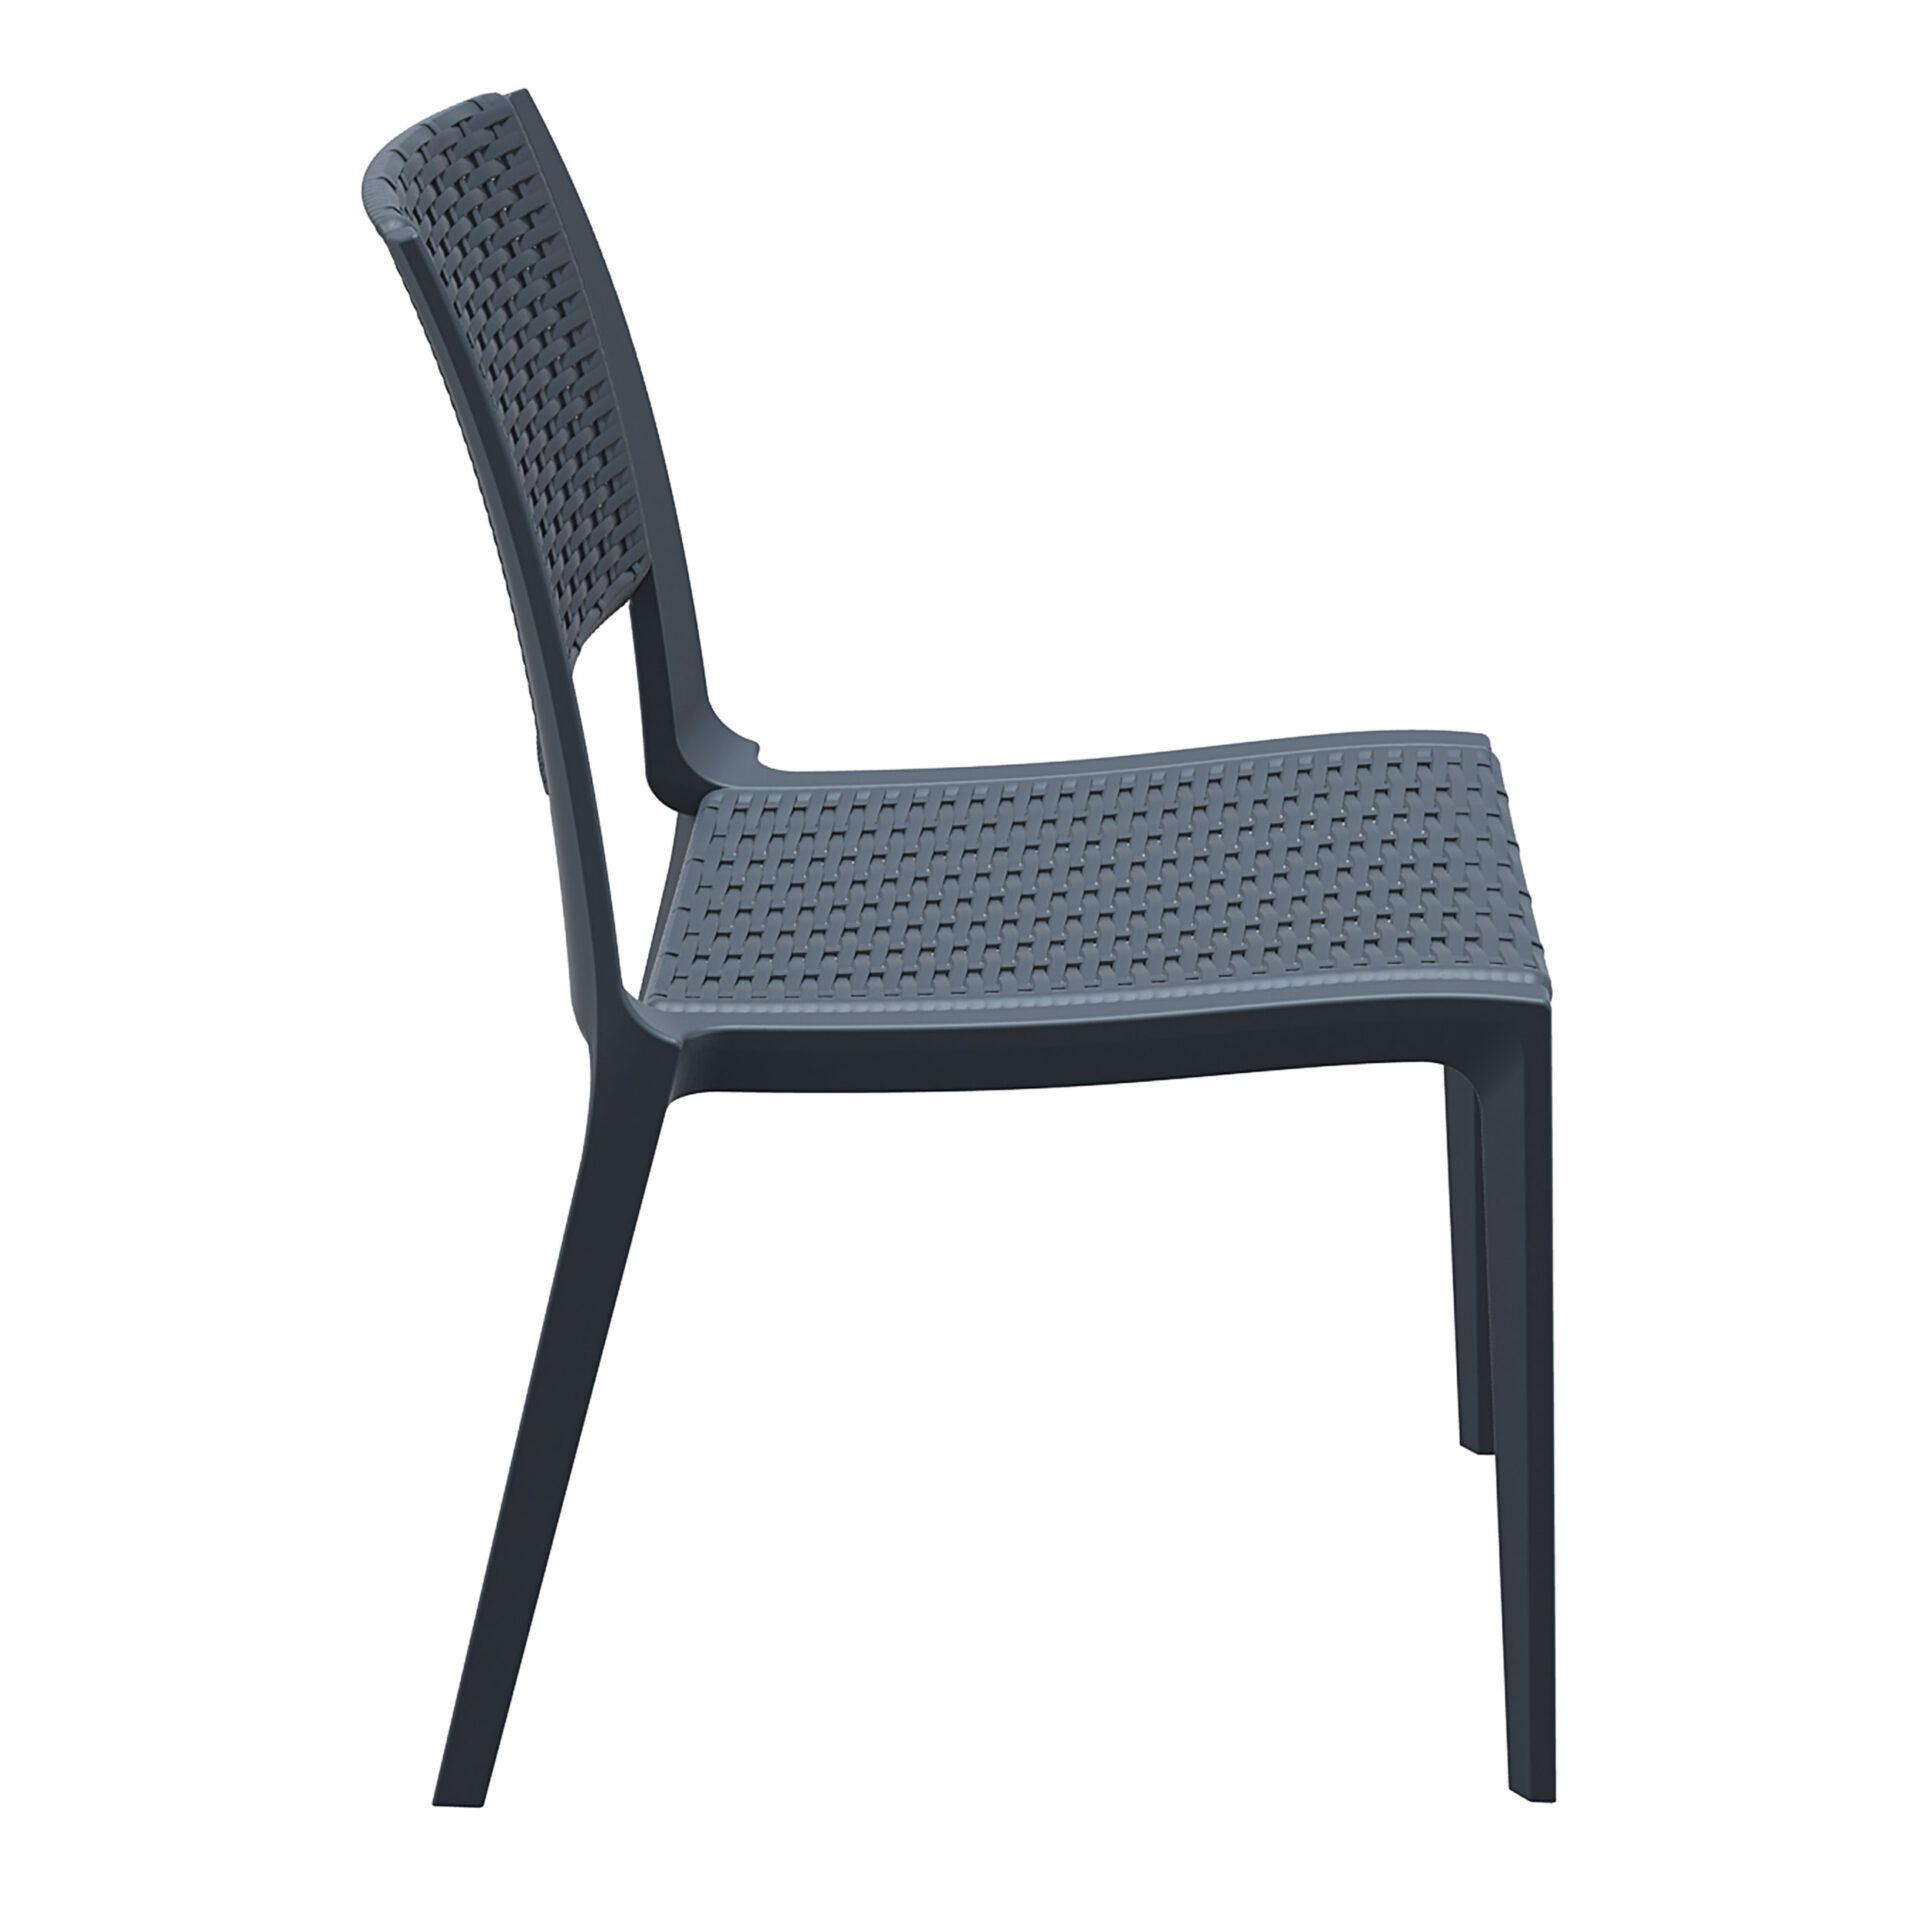 resin rattan outdoor cafe verona chair darkgrey side